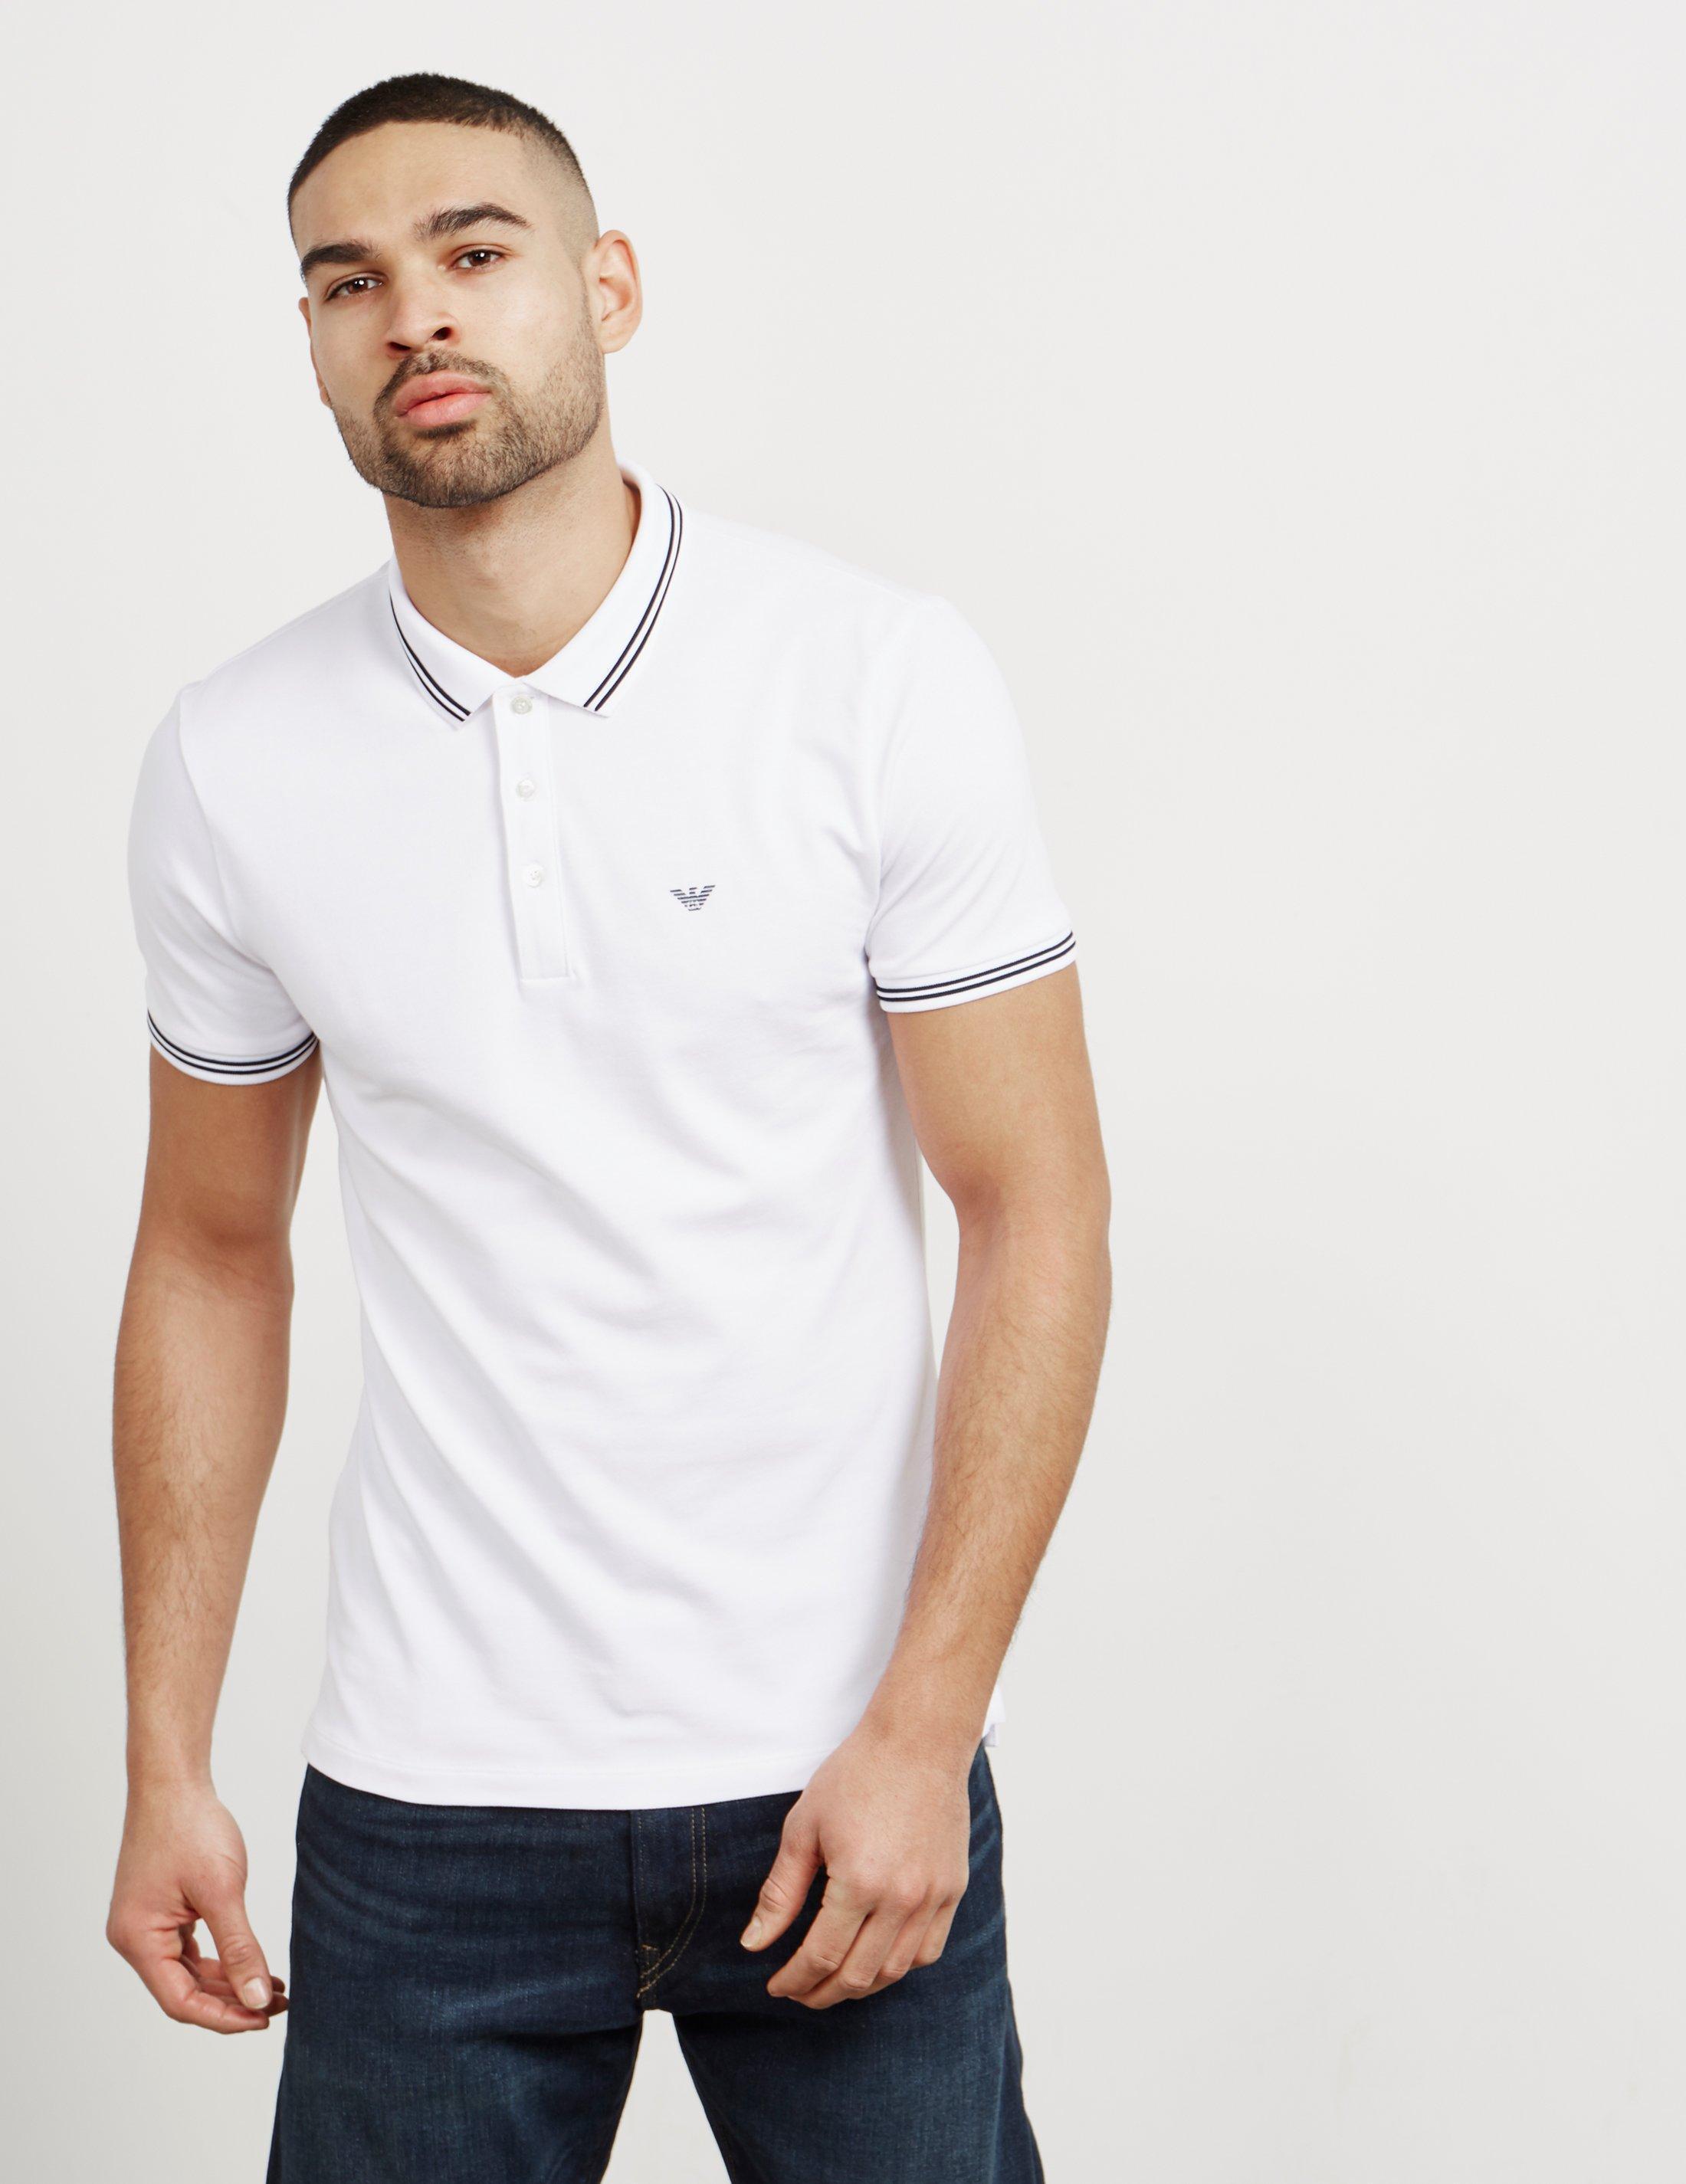 Short Shirt Armani Emporio Sleeve Mens Basic Tipped Polo Lyst wXUWq1gnw